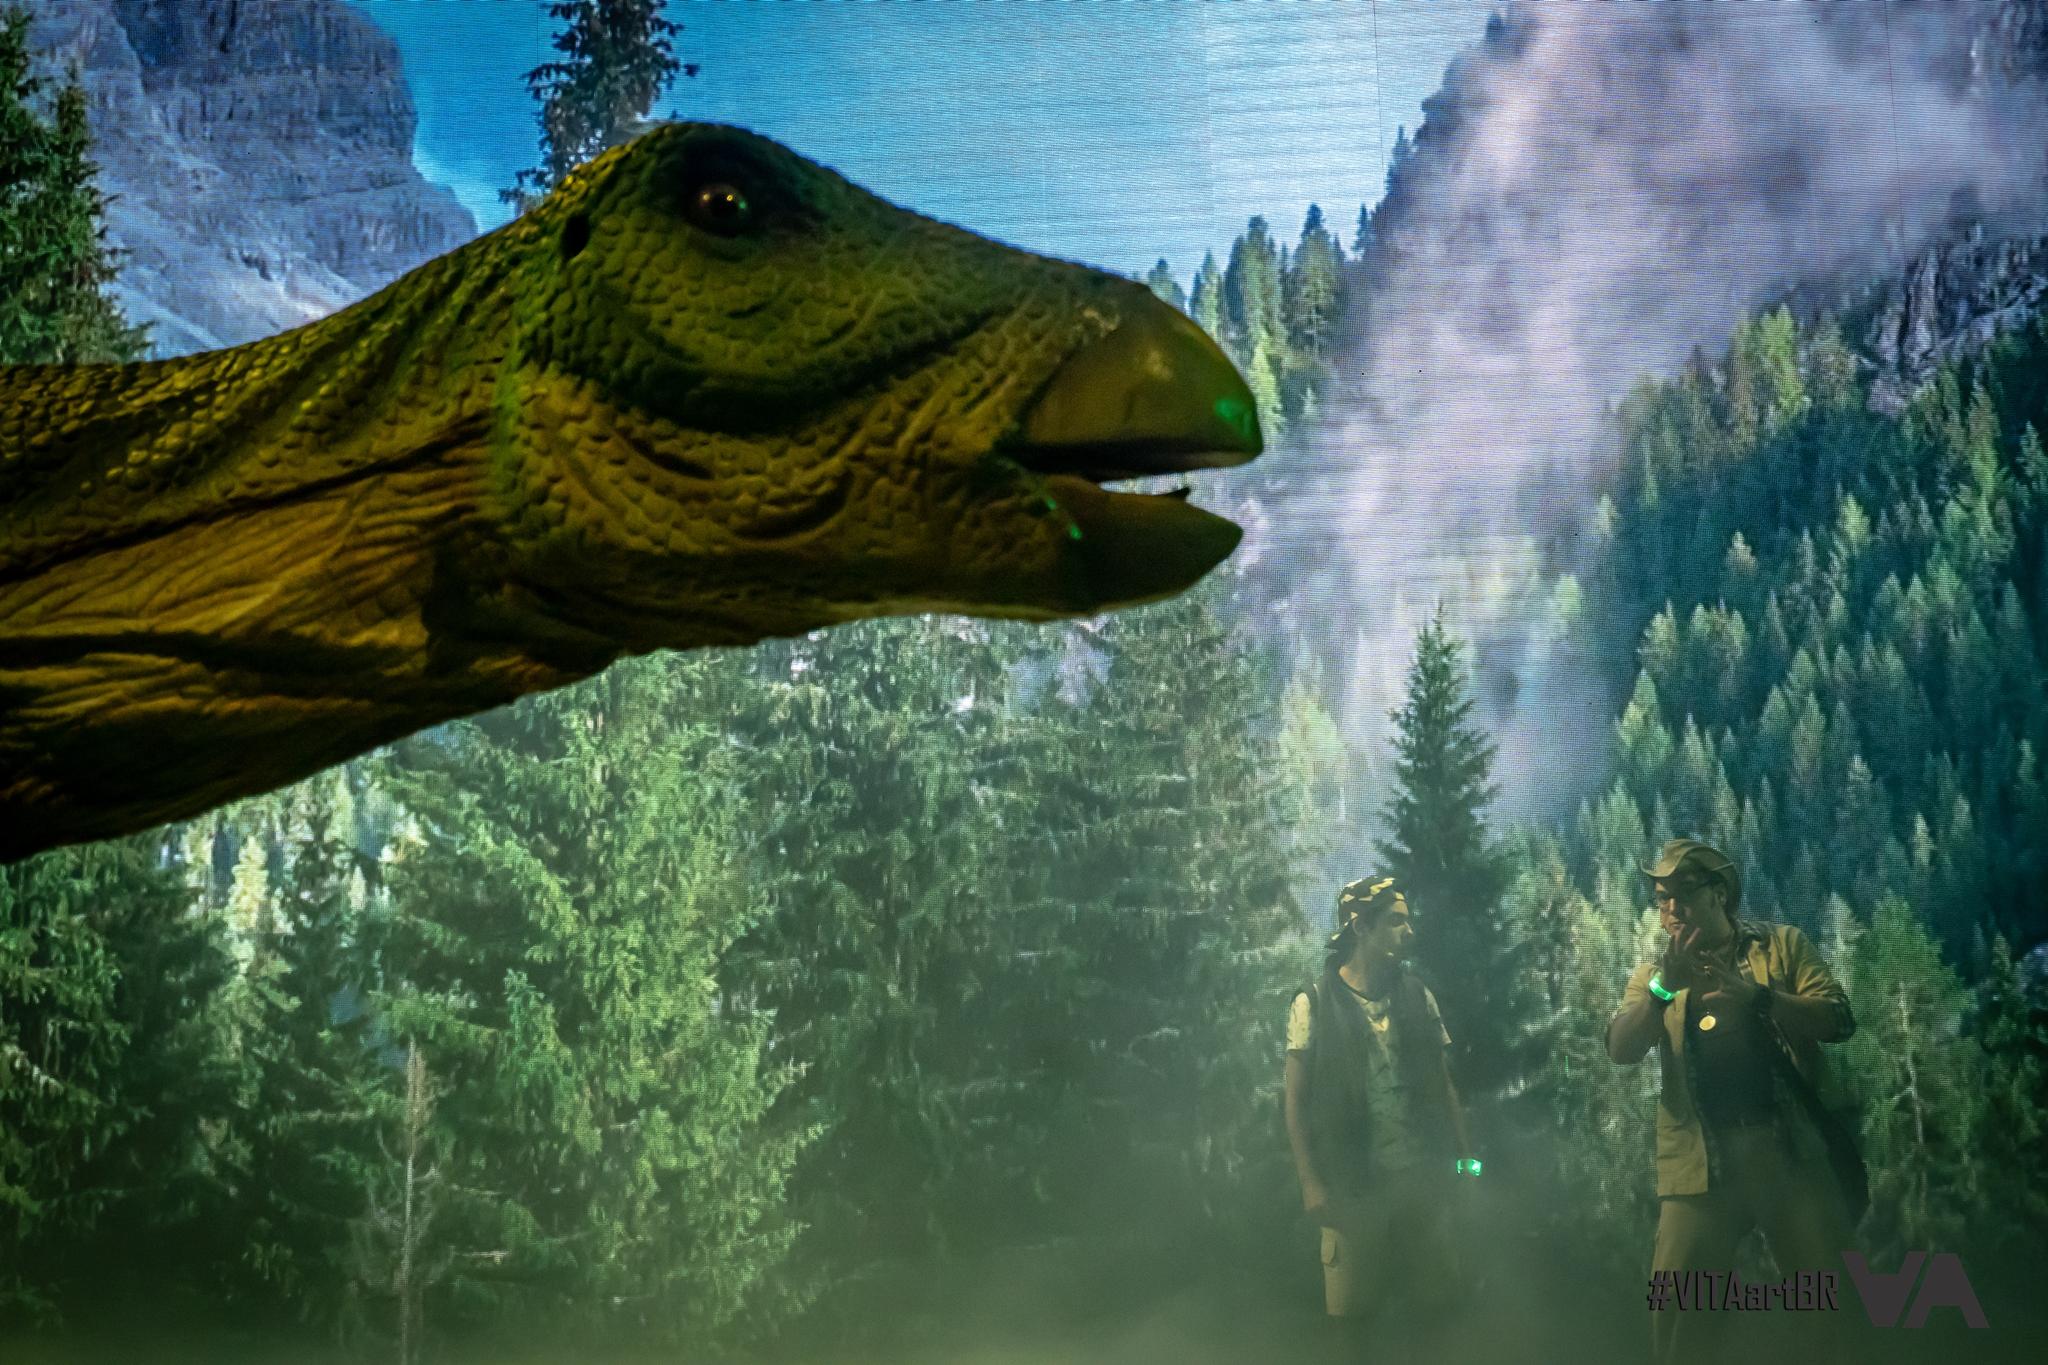 VITAartBR - DinosExperience - 33